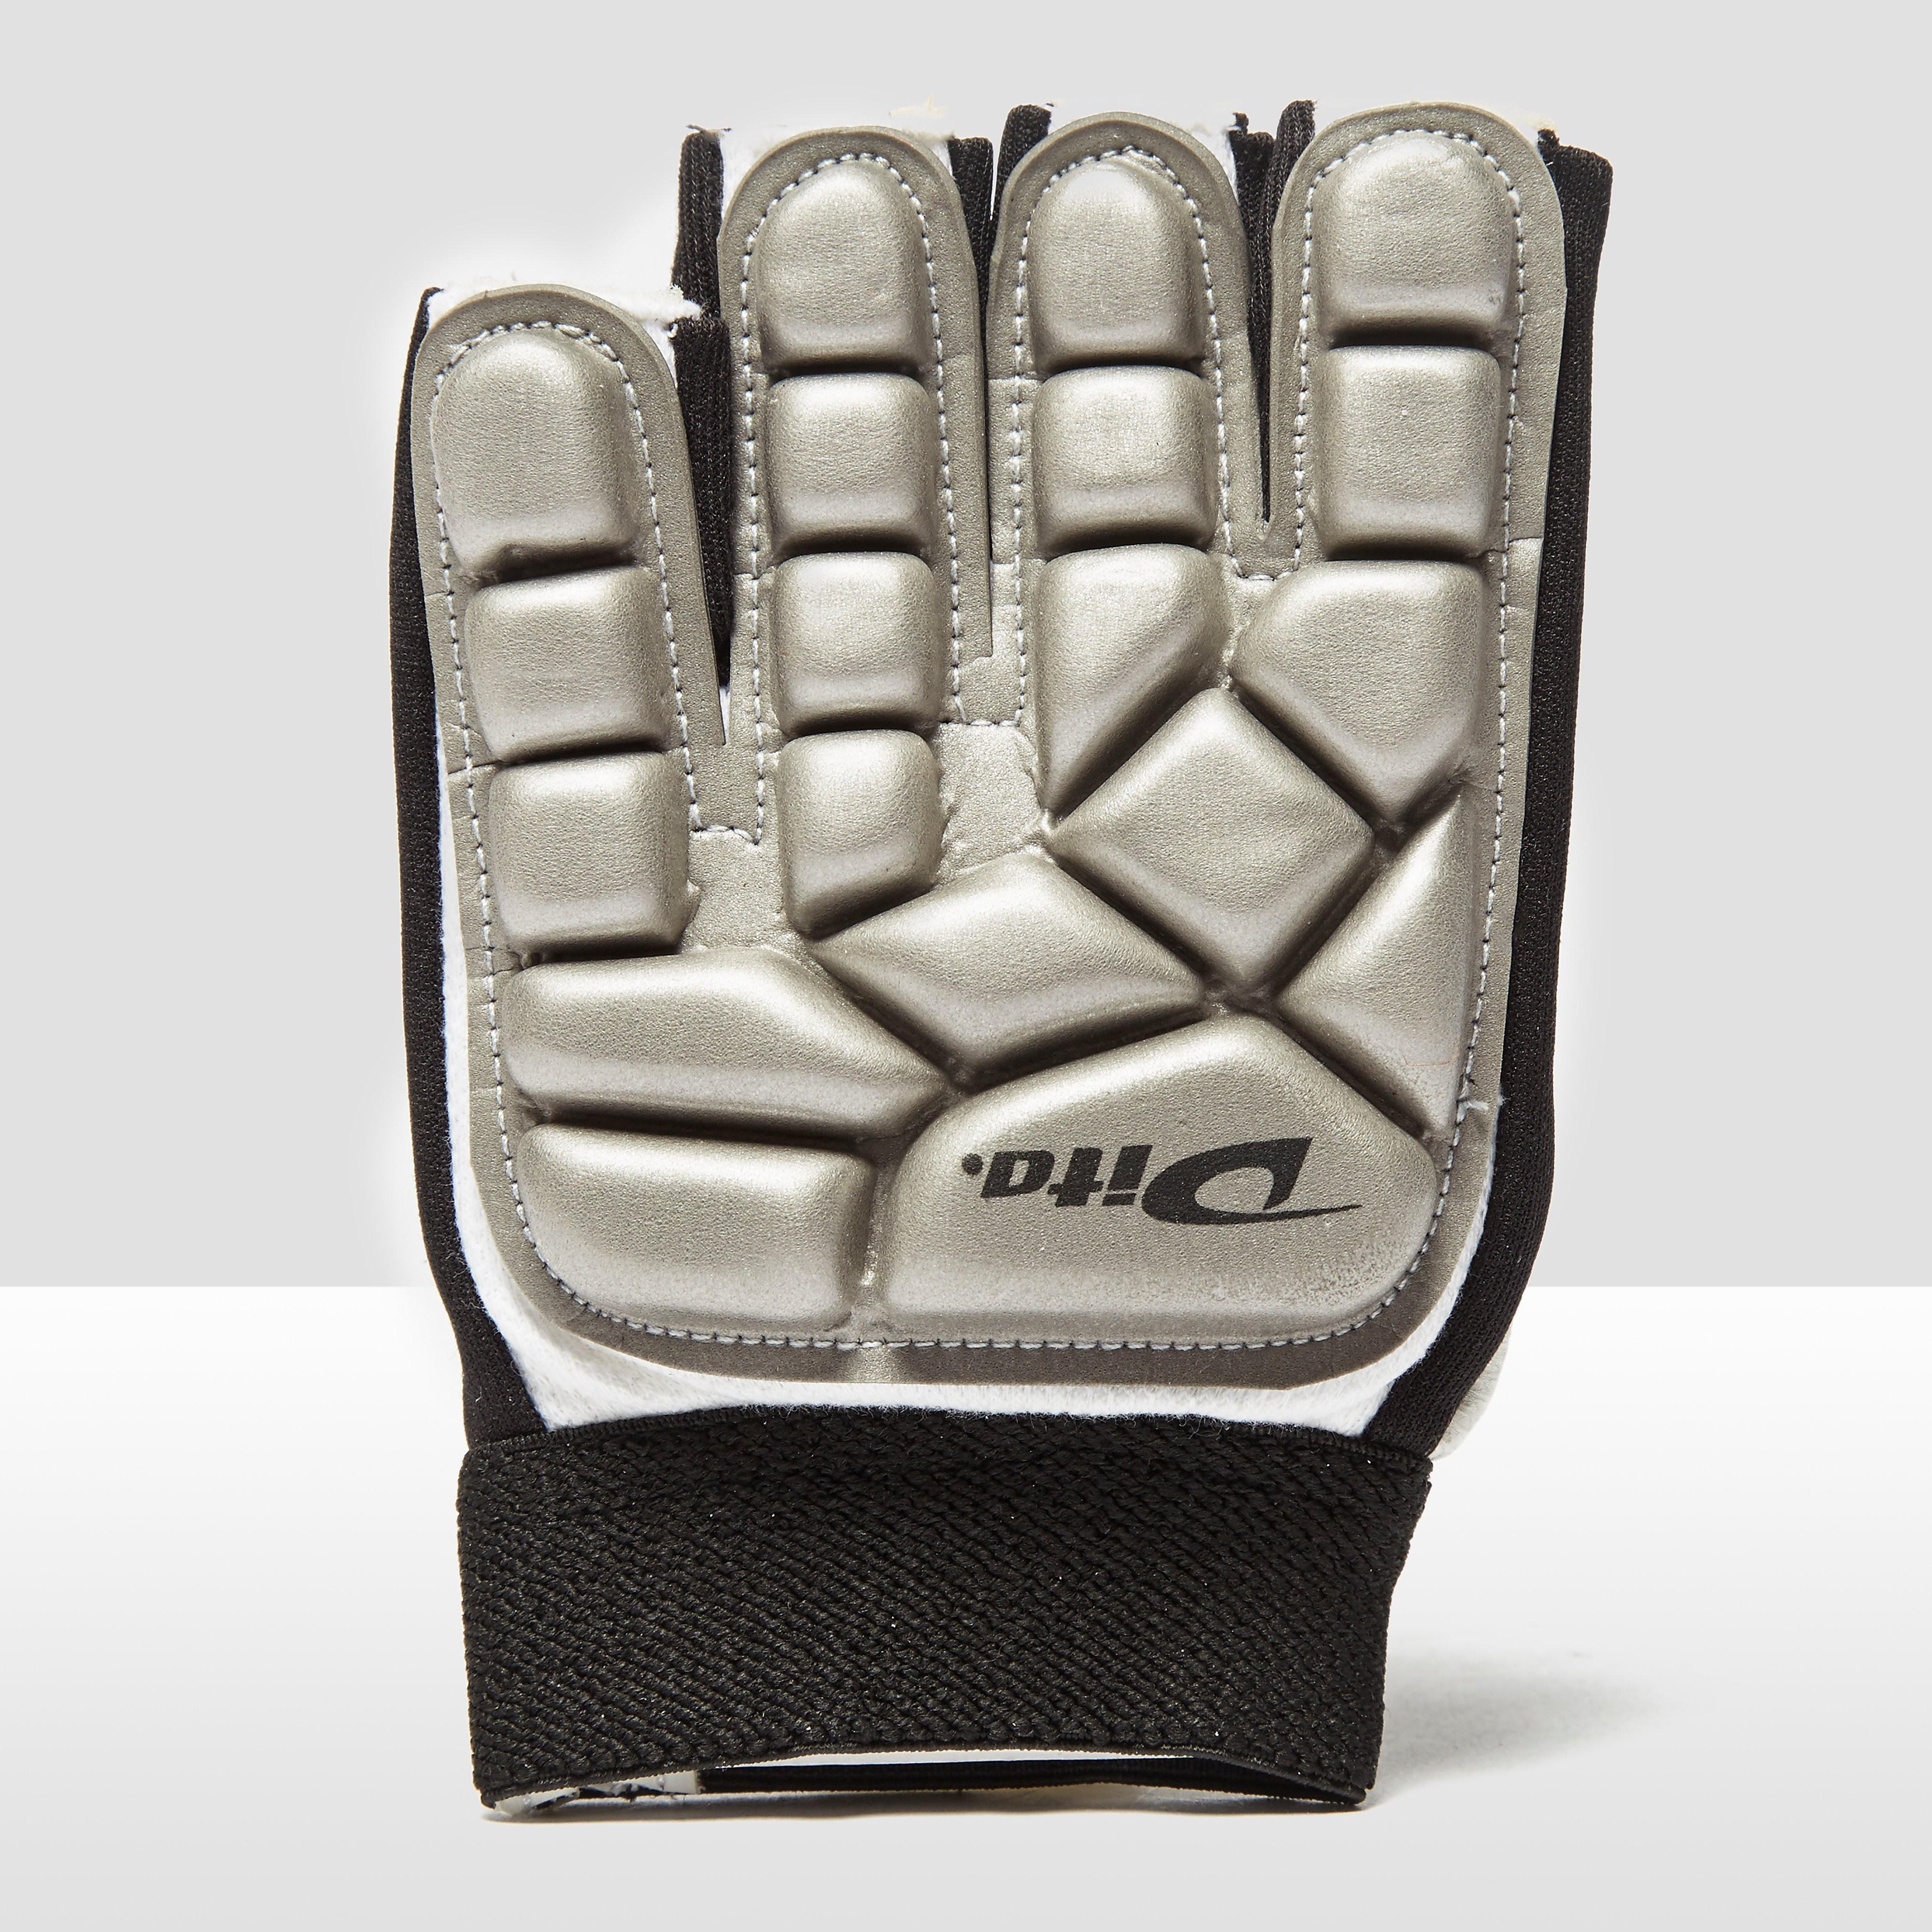 Dita Super Hockey Glove